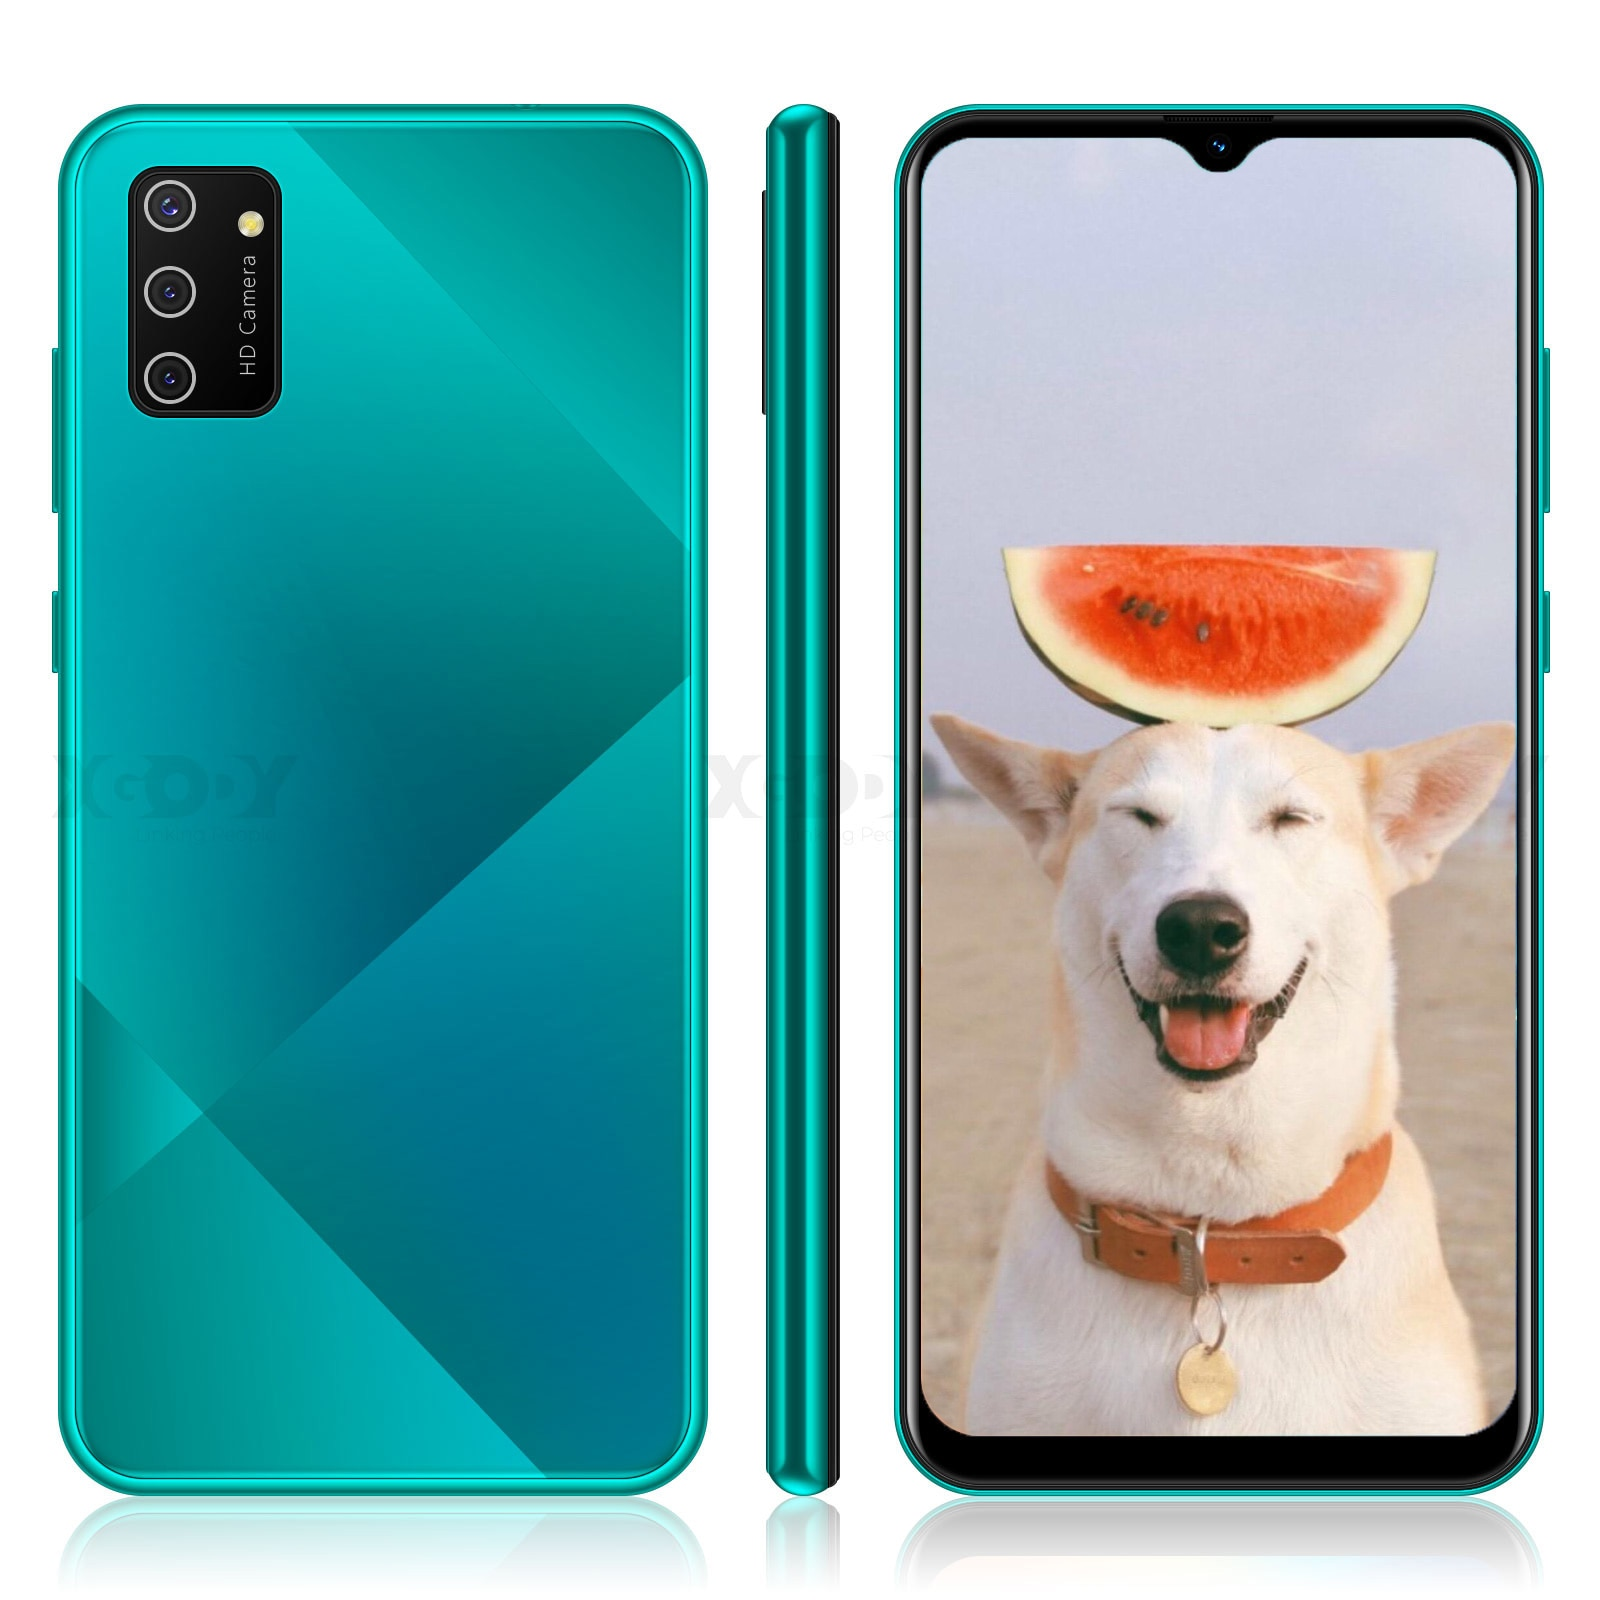 mobile phones android 9.0 XGODY S20 3G smartphone 1GB RAM 4GB ROM 5MP Camera Dual SIM Unlock WIFI 6.5